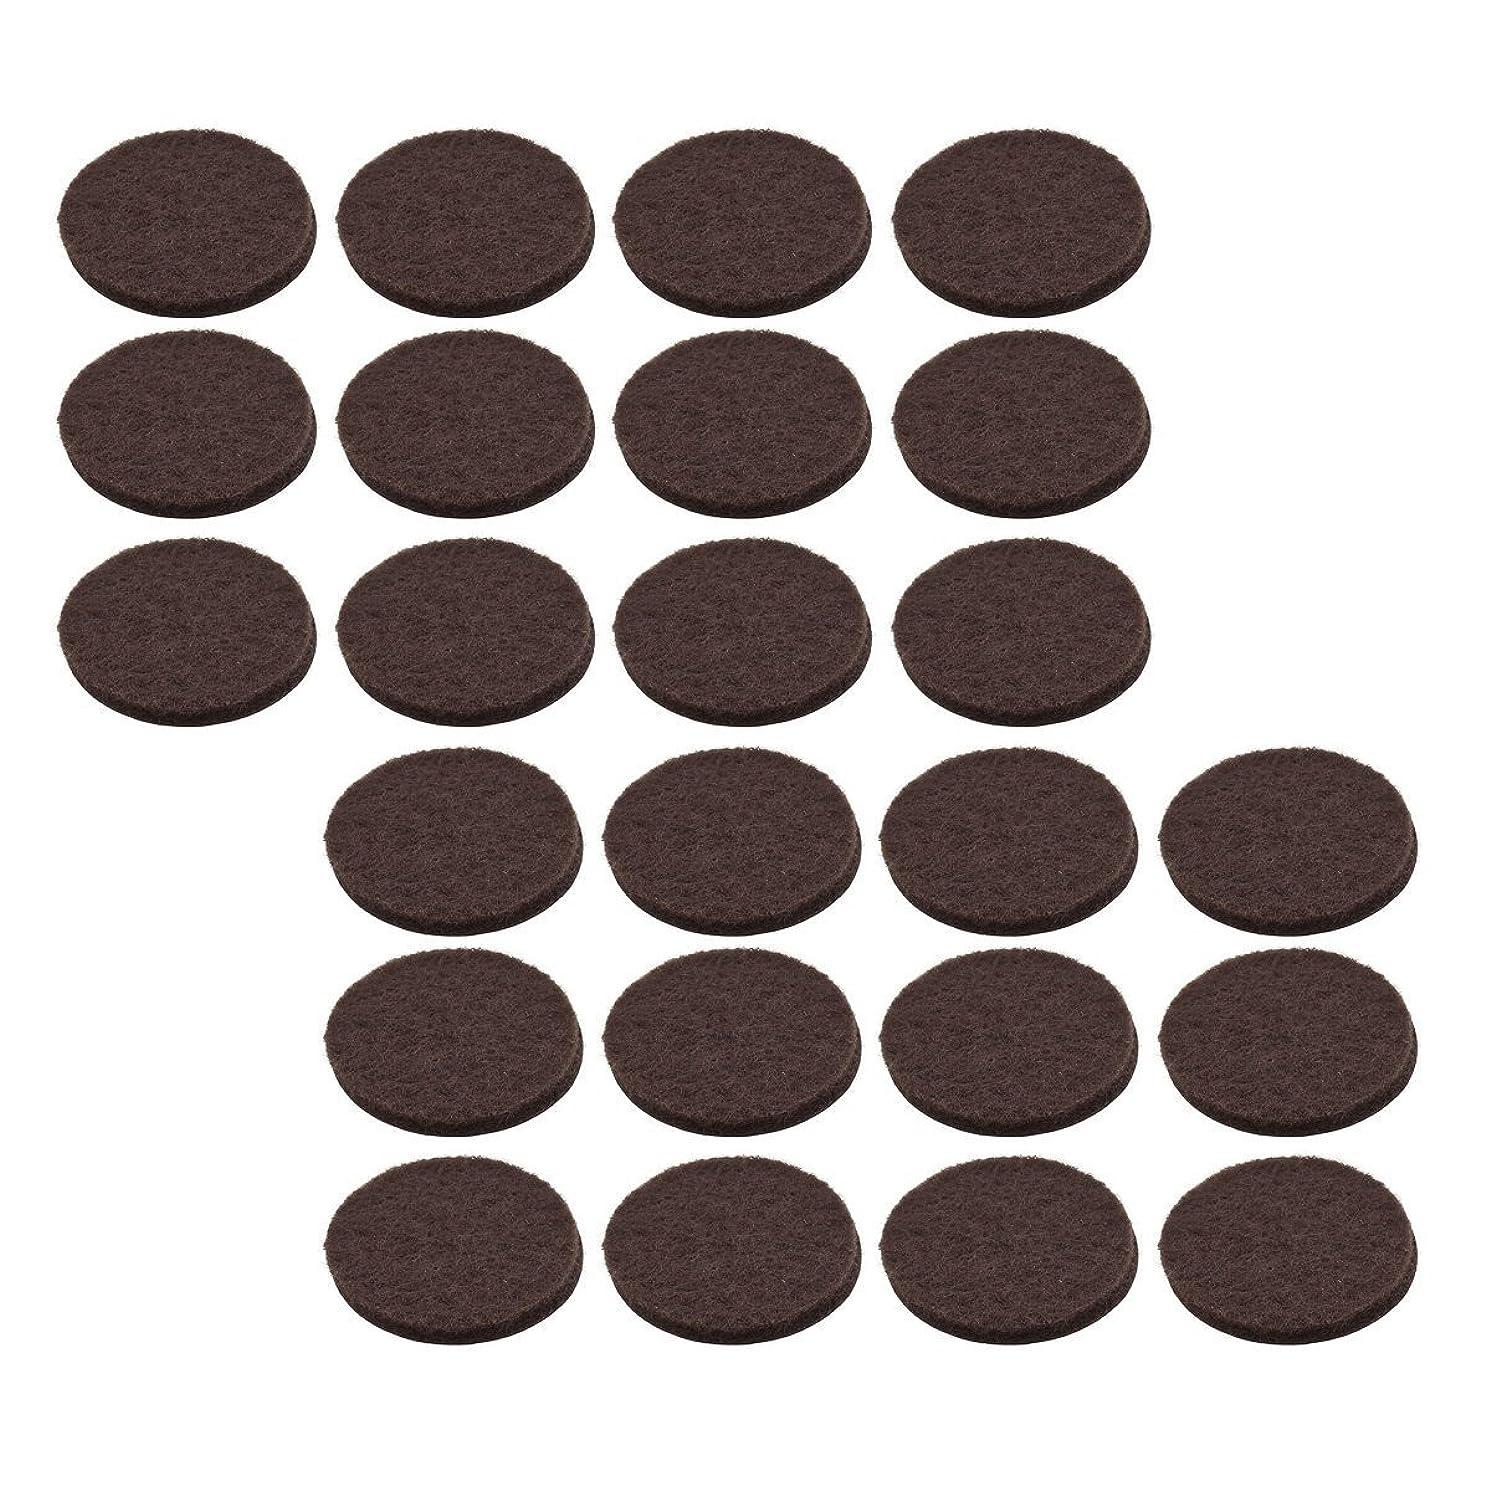 Stanley S845-299 1/2 Inch Round Medium Duty Self Adhesive Brown Felt Pads Pack of 24